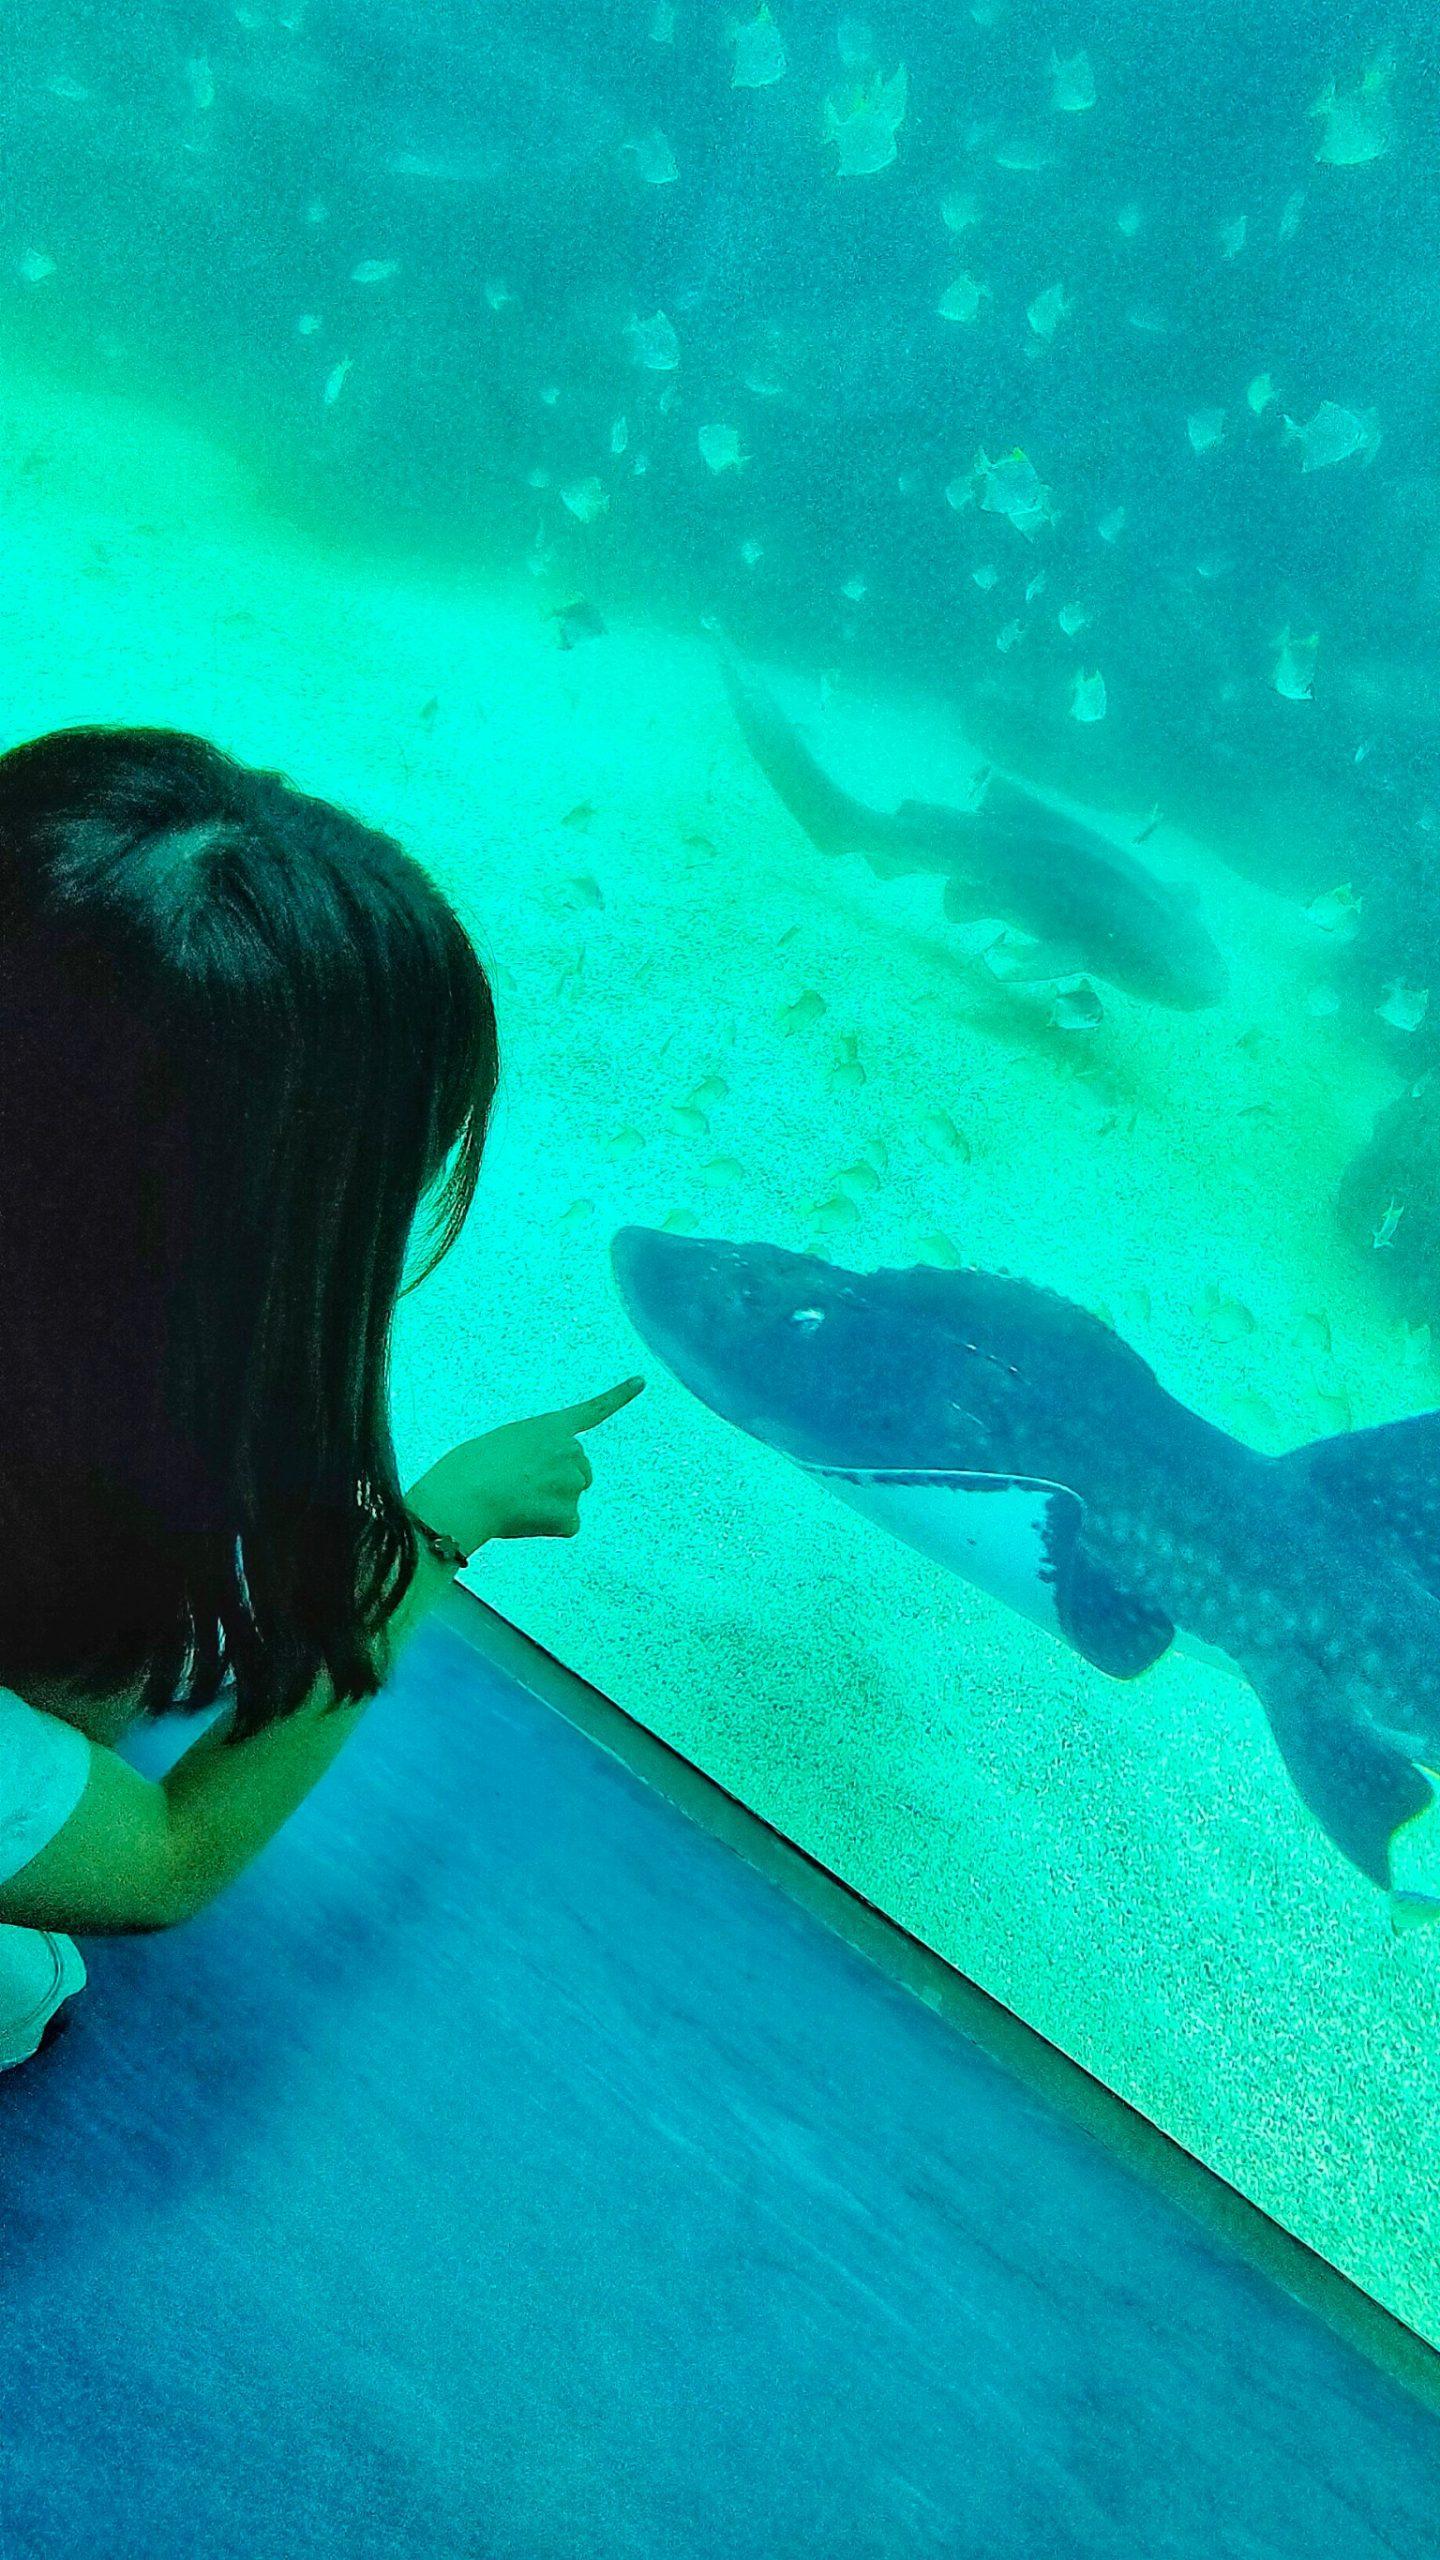 IG,KKDAY,Xpark,Xpark都會型水生公園,企鵝,八景島,新光影城,日本,水母,網美,親子互動,青埔水族館,鯊魚 @民宿女王芽月-美食.旅遊.全台趴趴走